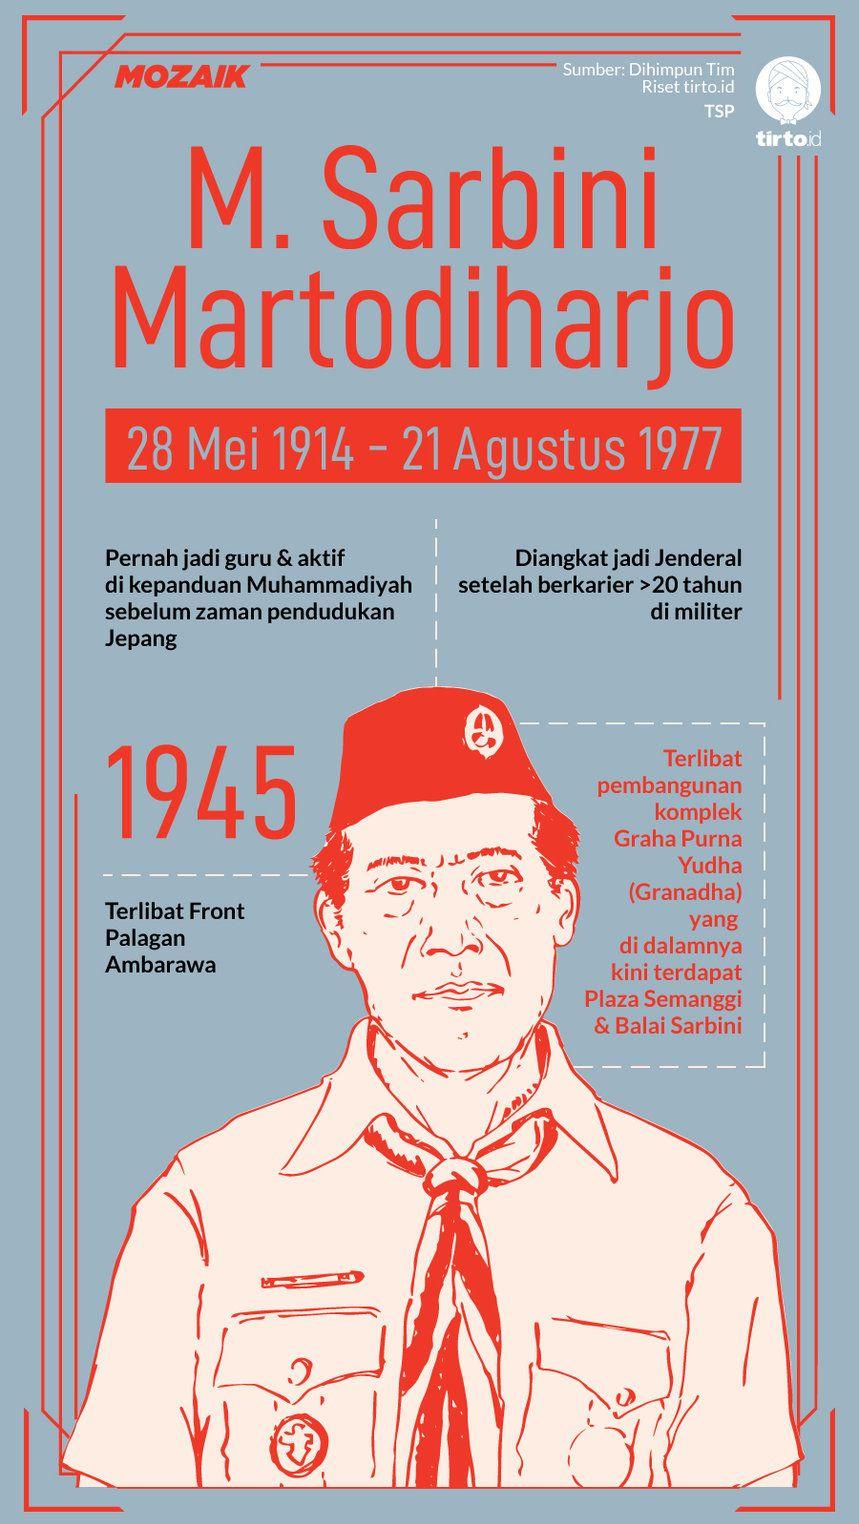 Foto Pahlawan Dari Jawa Timur